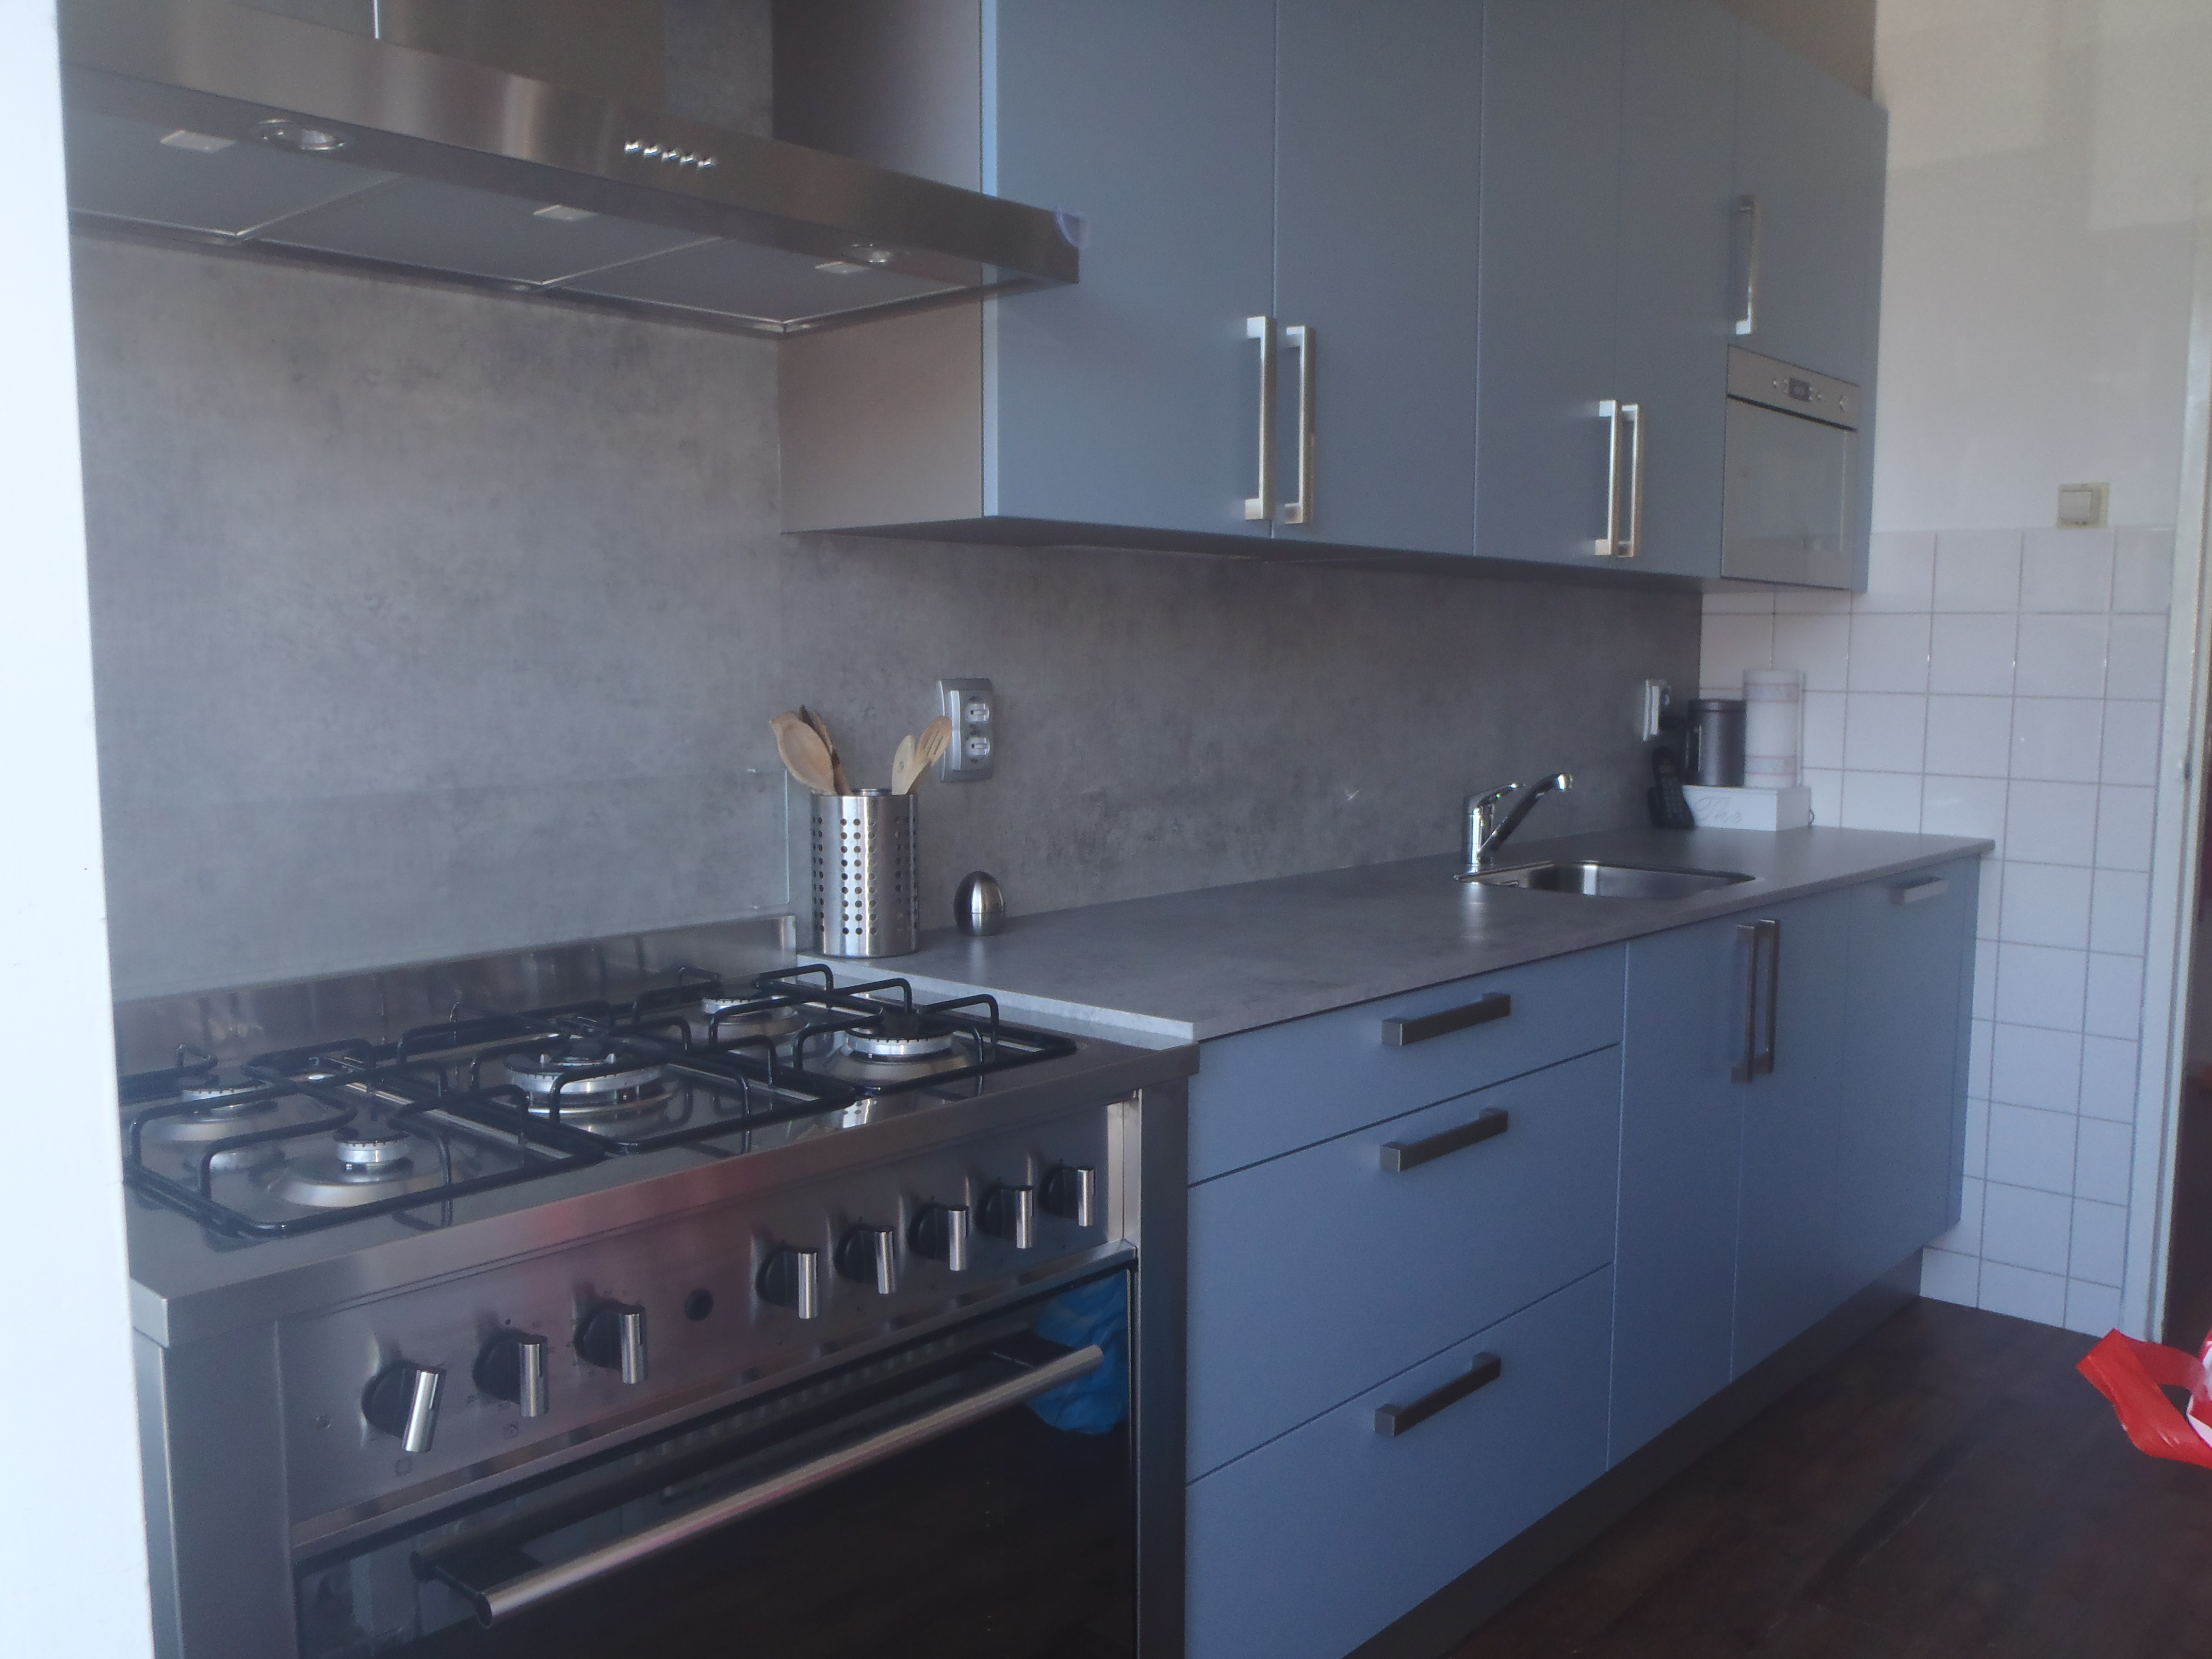 Keuken Kopen Amsterdam : Keuken referentieklant Keplinger uit Amsterdam – Grando Keukens & Bad